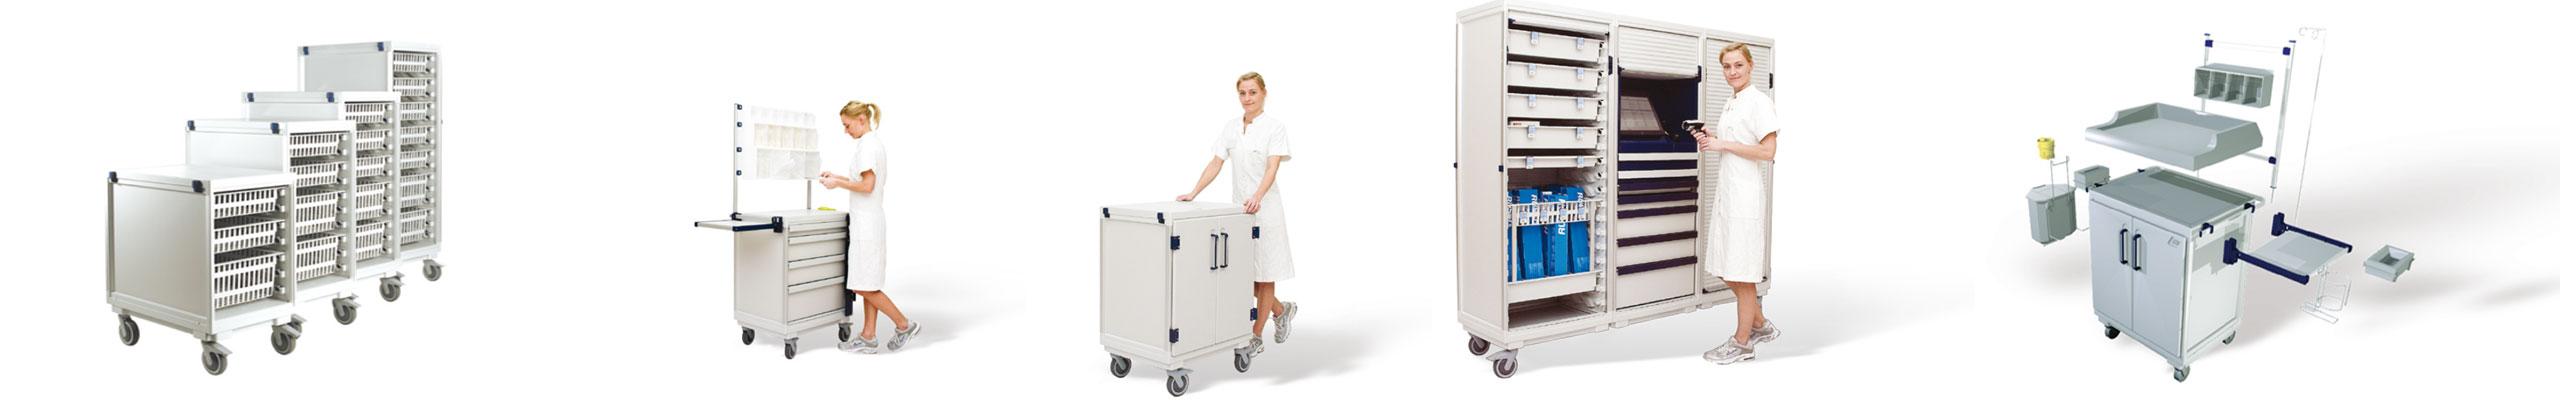 Pflegewagen ISO-Modulsystem